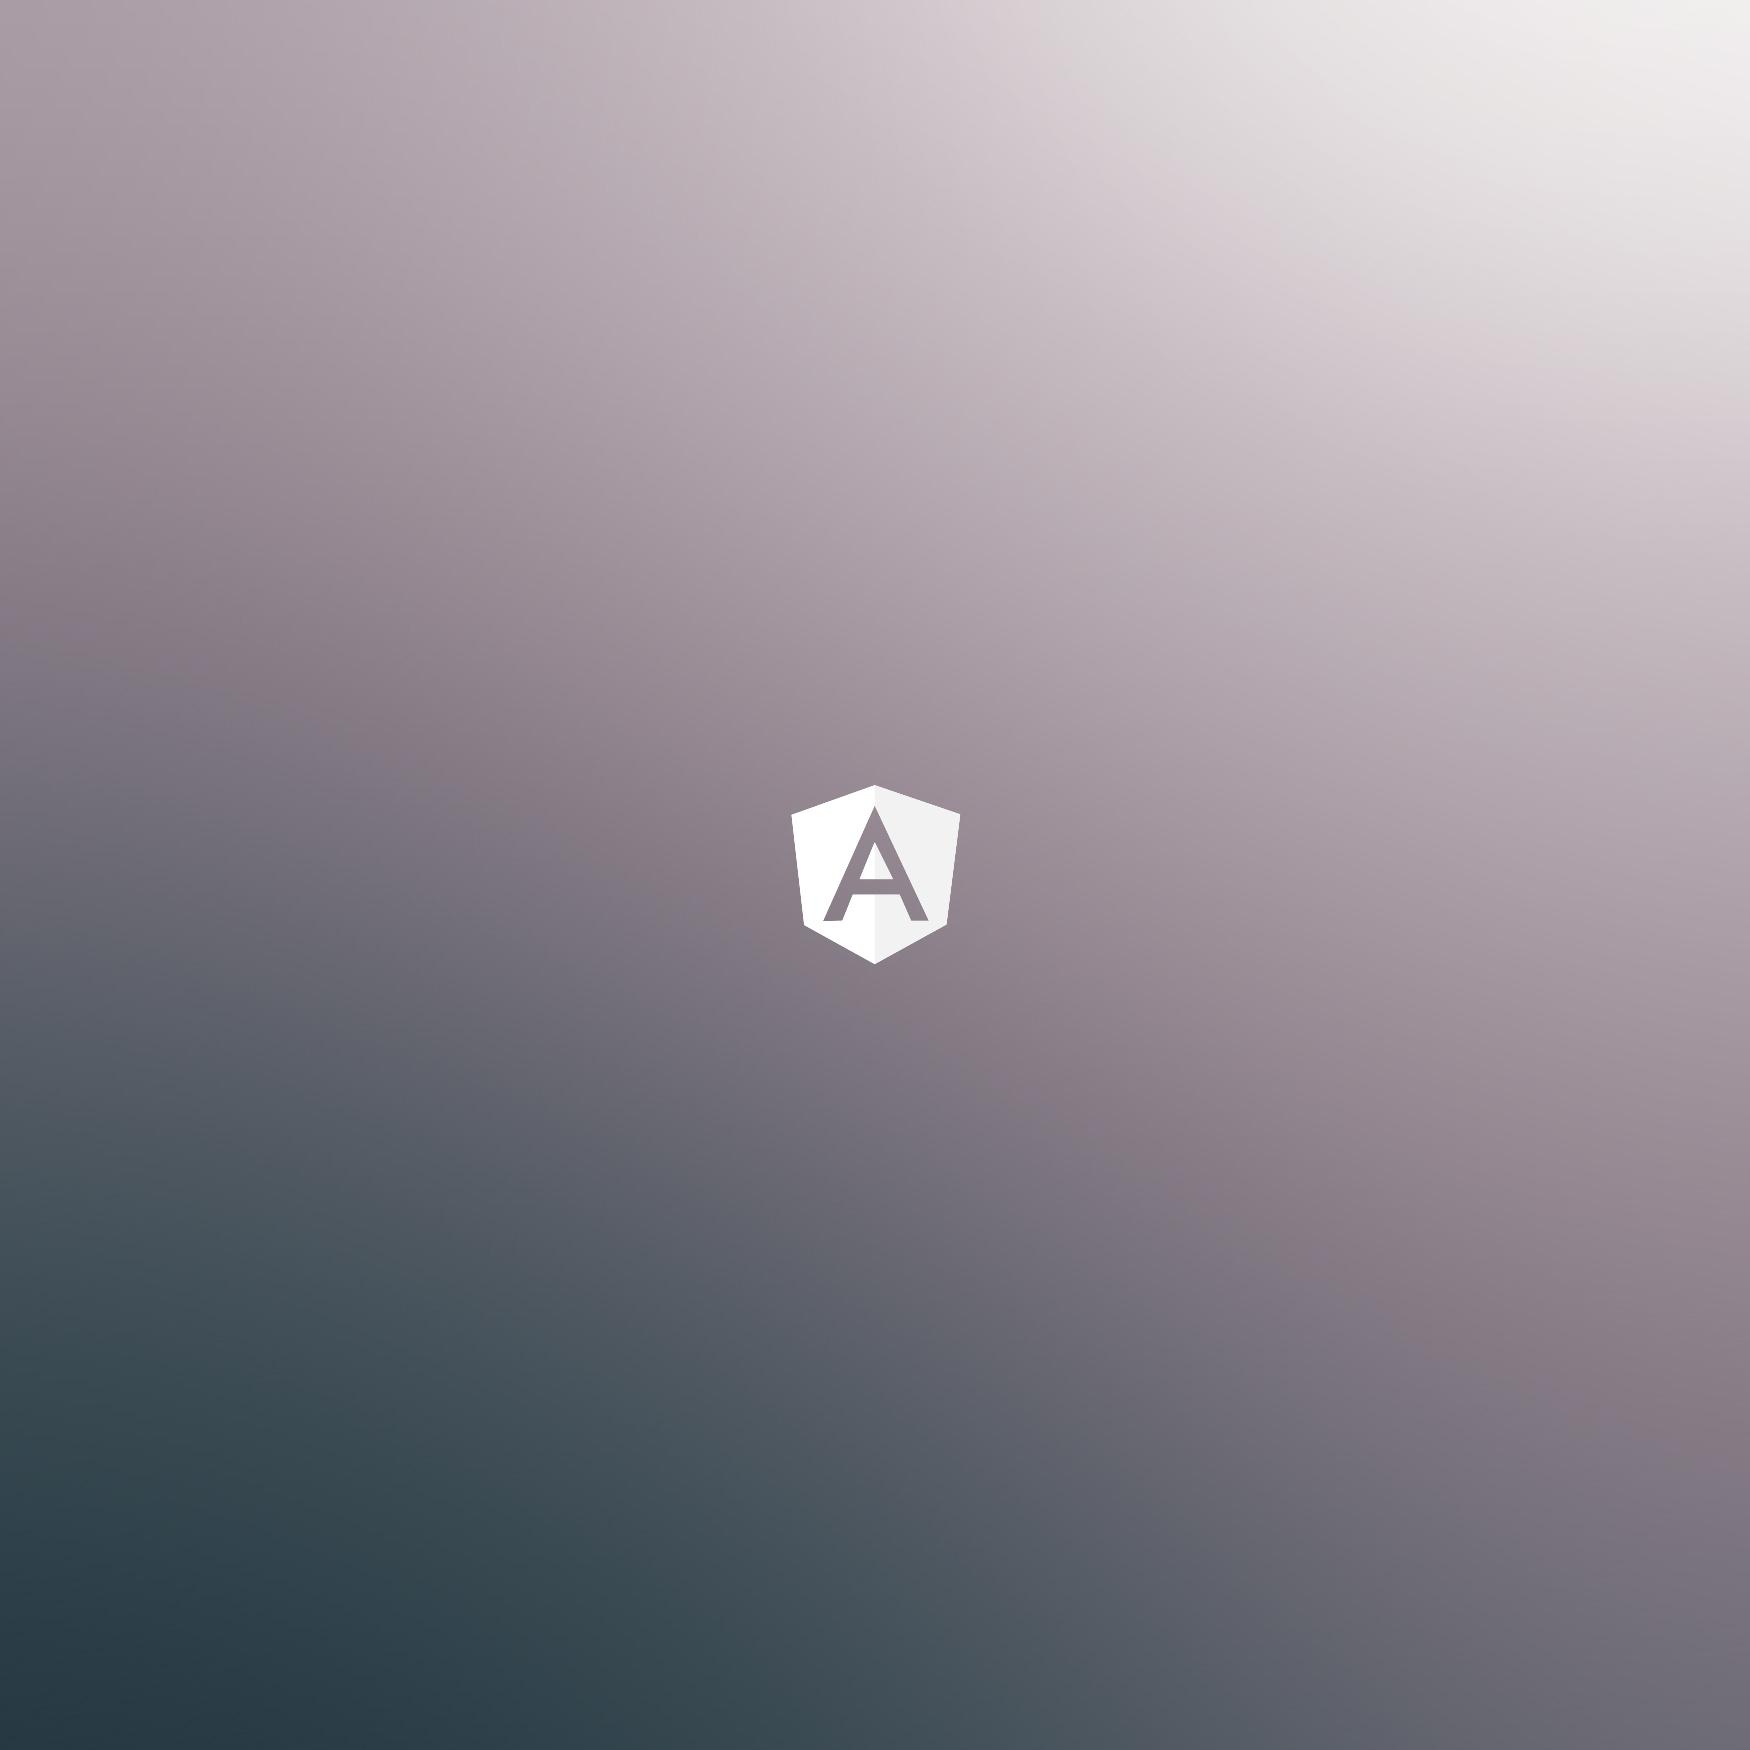 AngularJS HTML5 mode or pretty URLs on Apache (using htaccess)